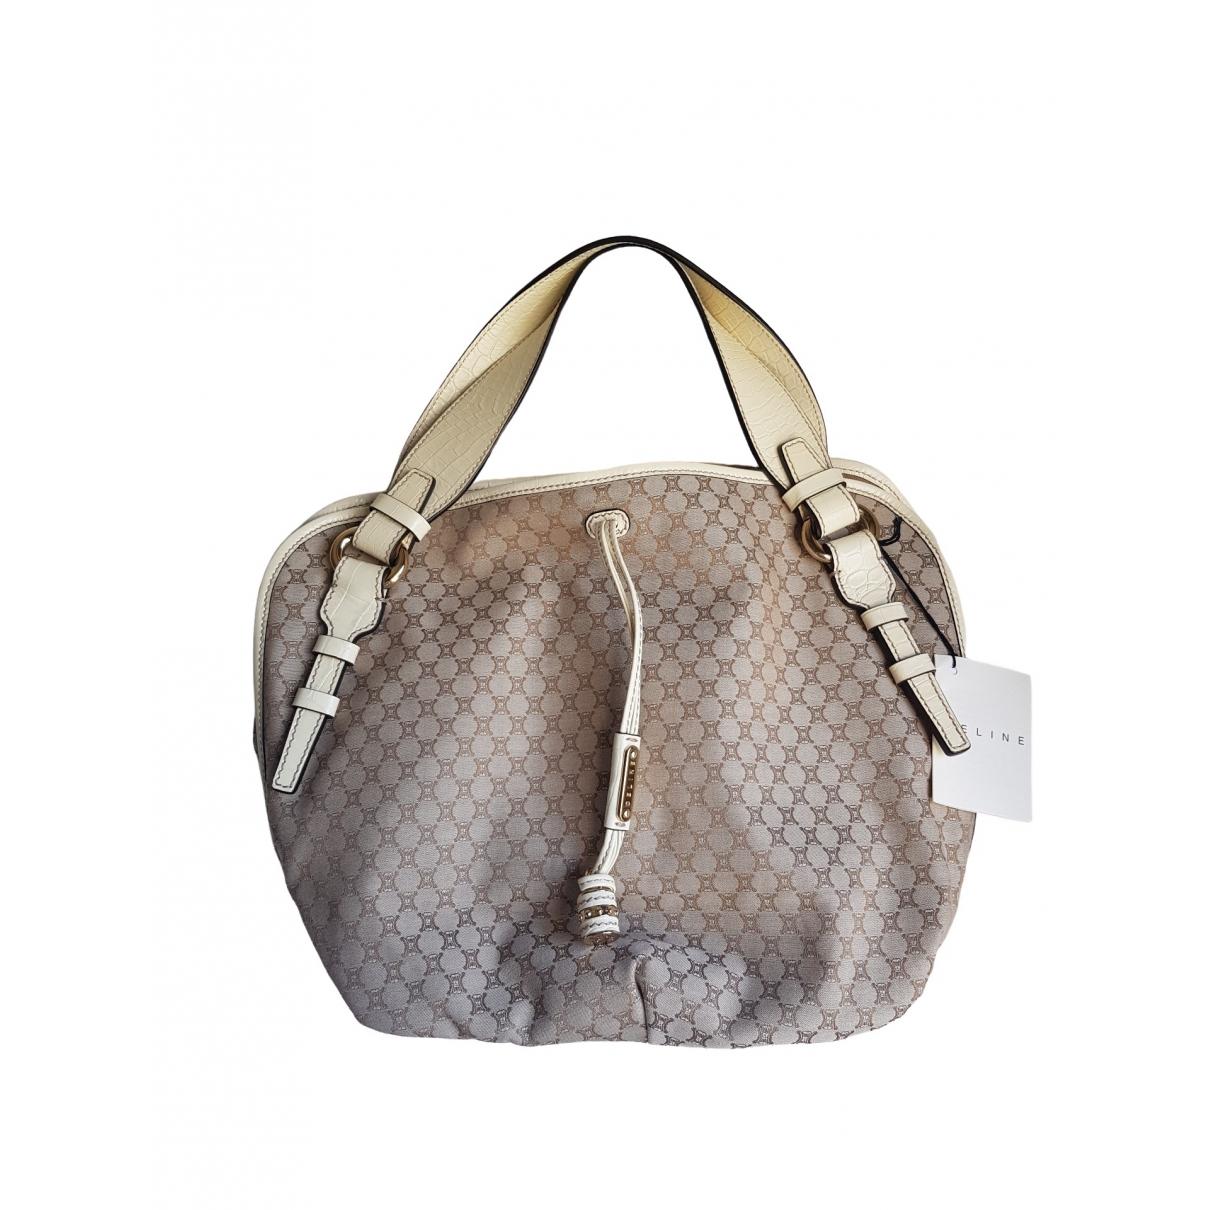 Celine \N Handtasche in  Beige Baumwolle